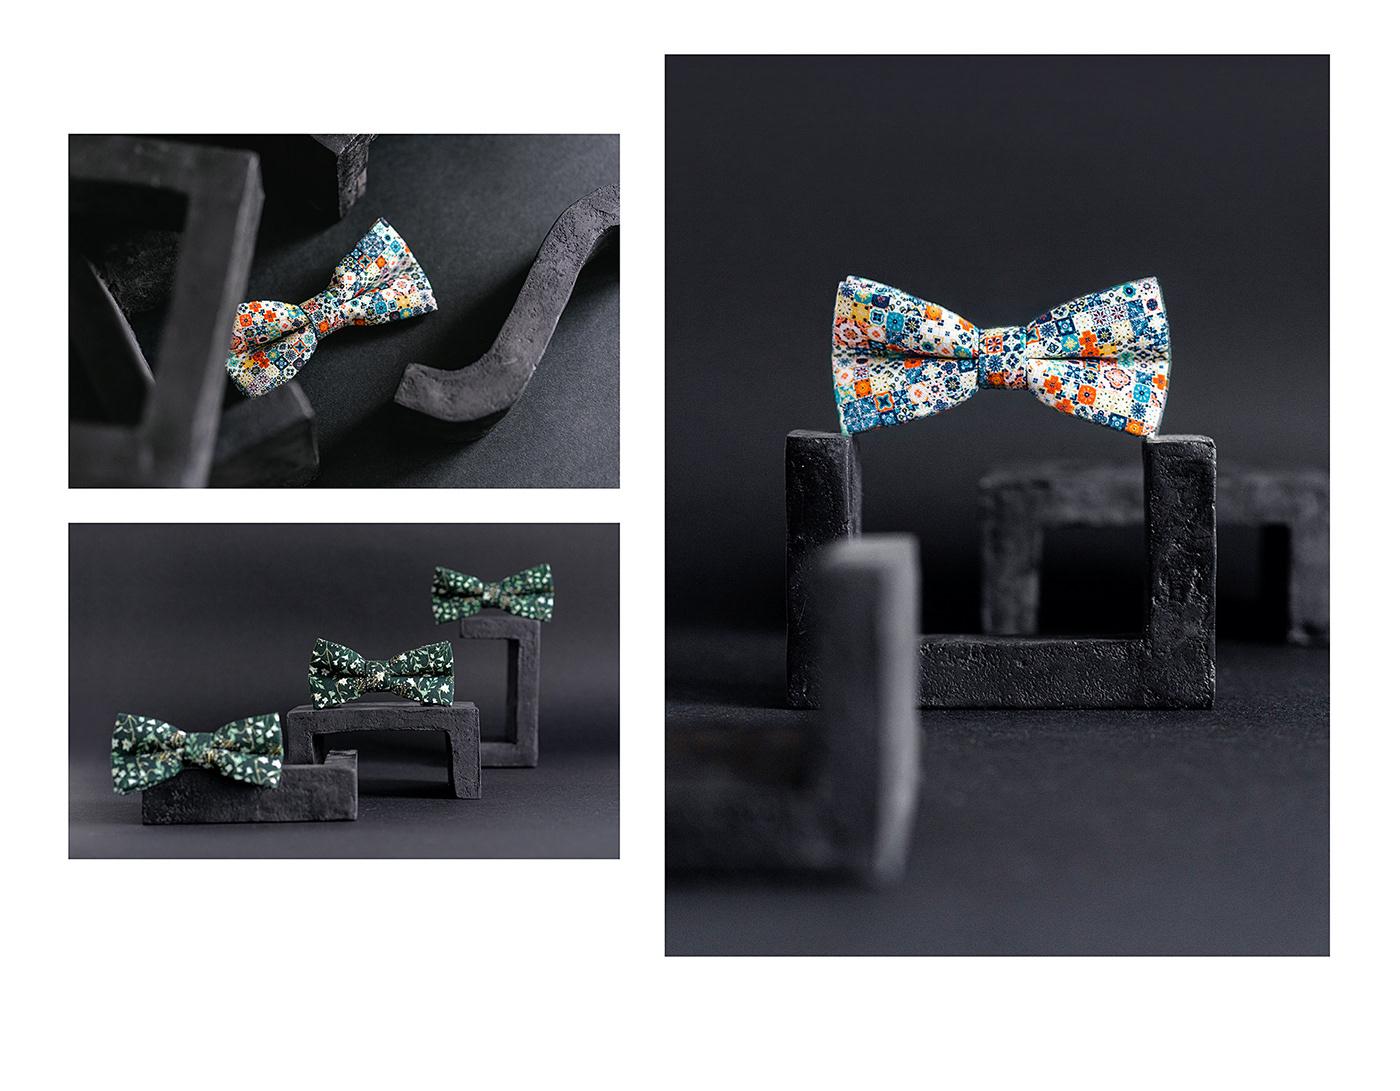 Set design, photoshooting for MUCHAMA with black blocks